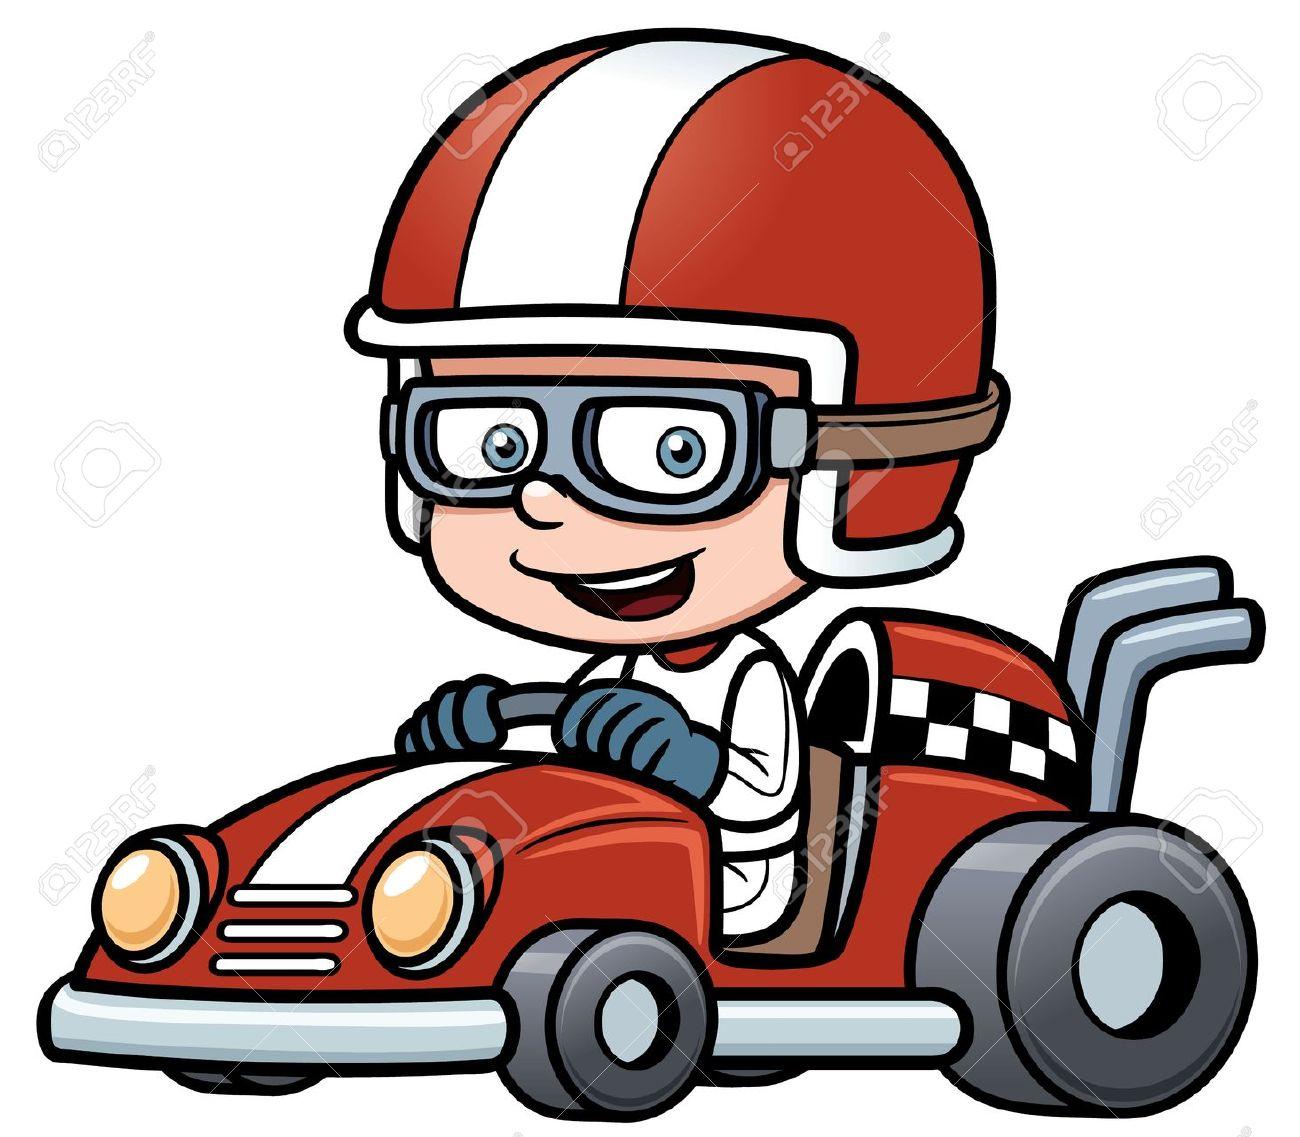 1300x1137 Kart racing clipart